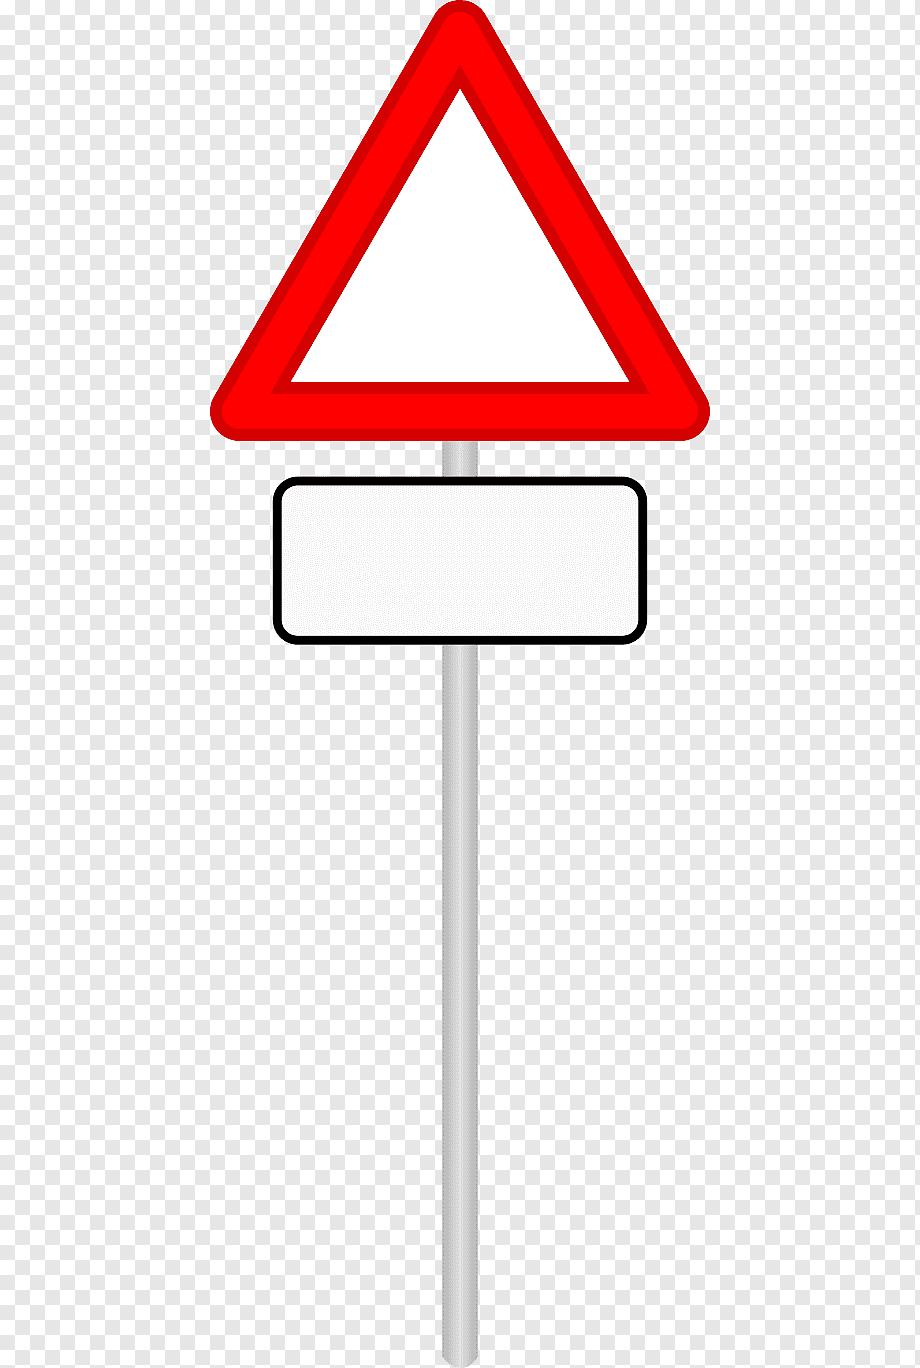 Rambu Rambu Lalu Lintas Png : rambu, lintas, Traffic, Warning, Sign,, Road,, Angle,, Rectangle,, Triangle, PNGWing